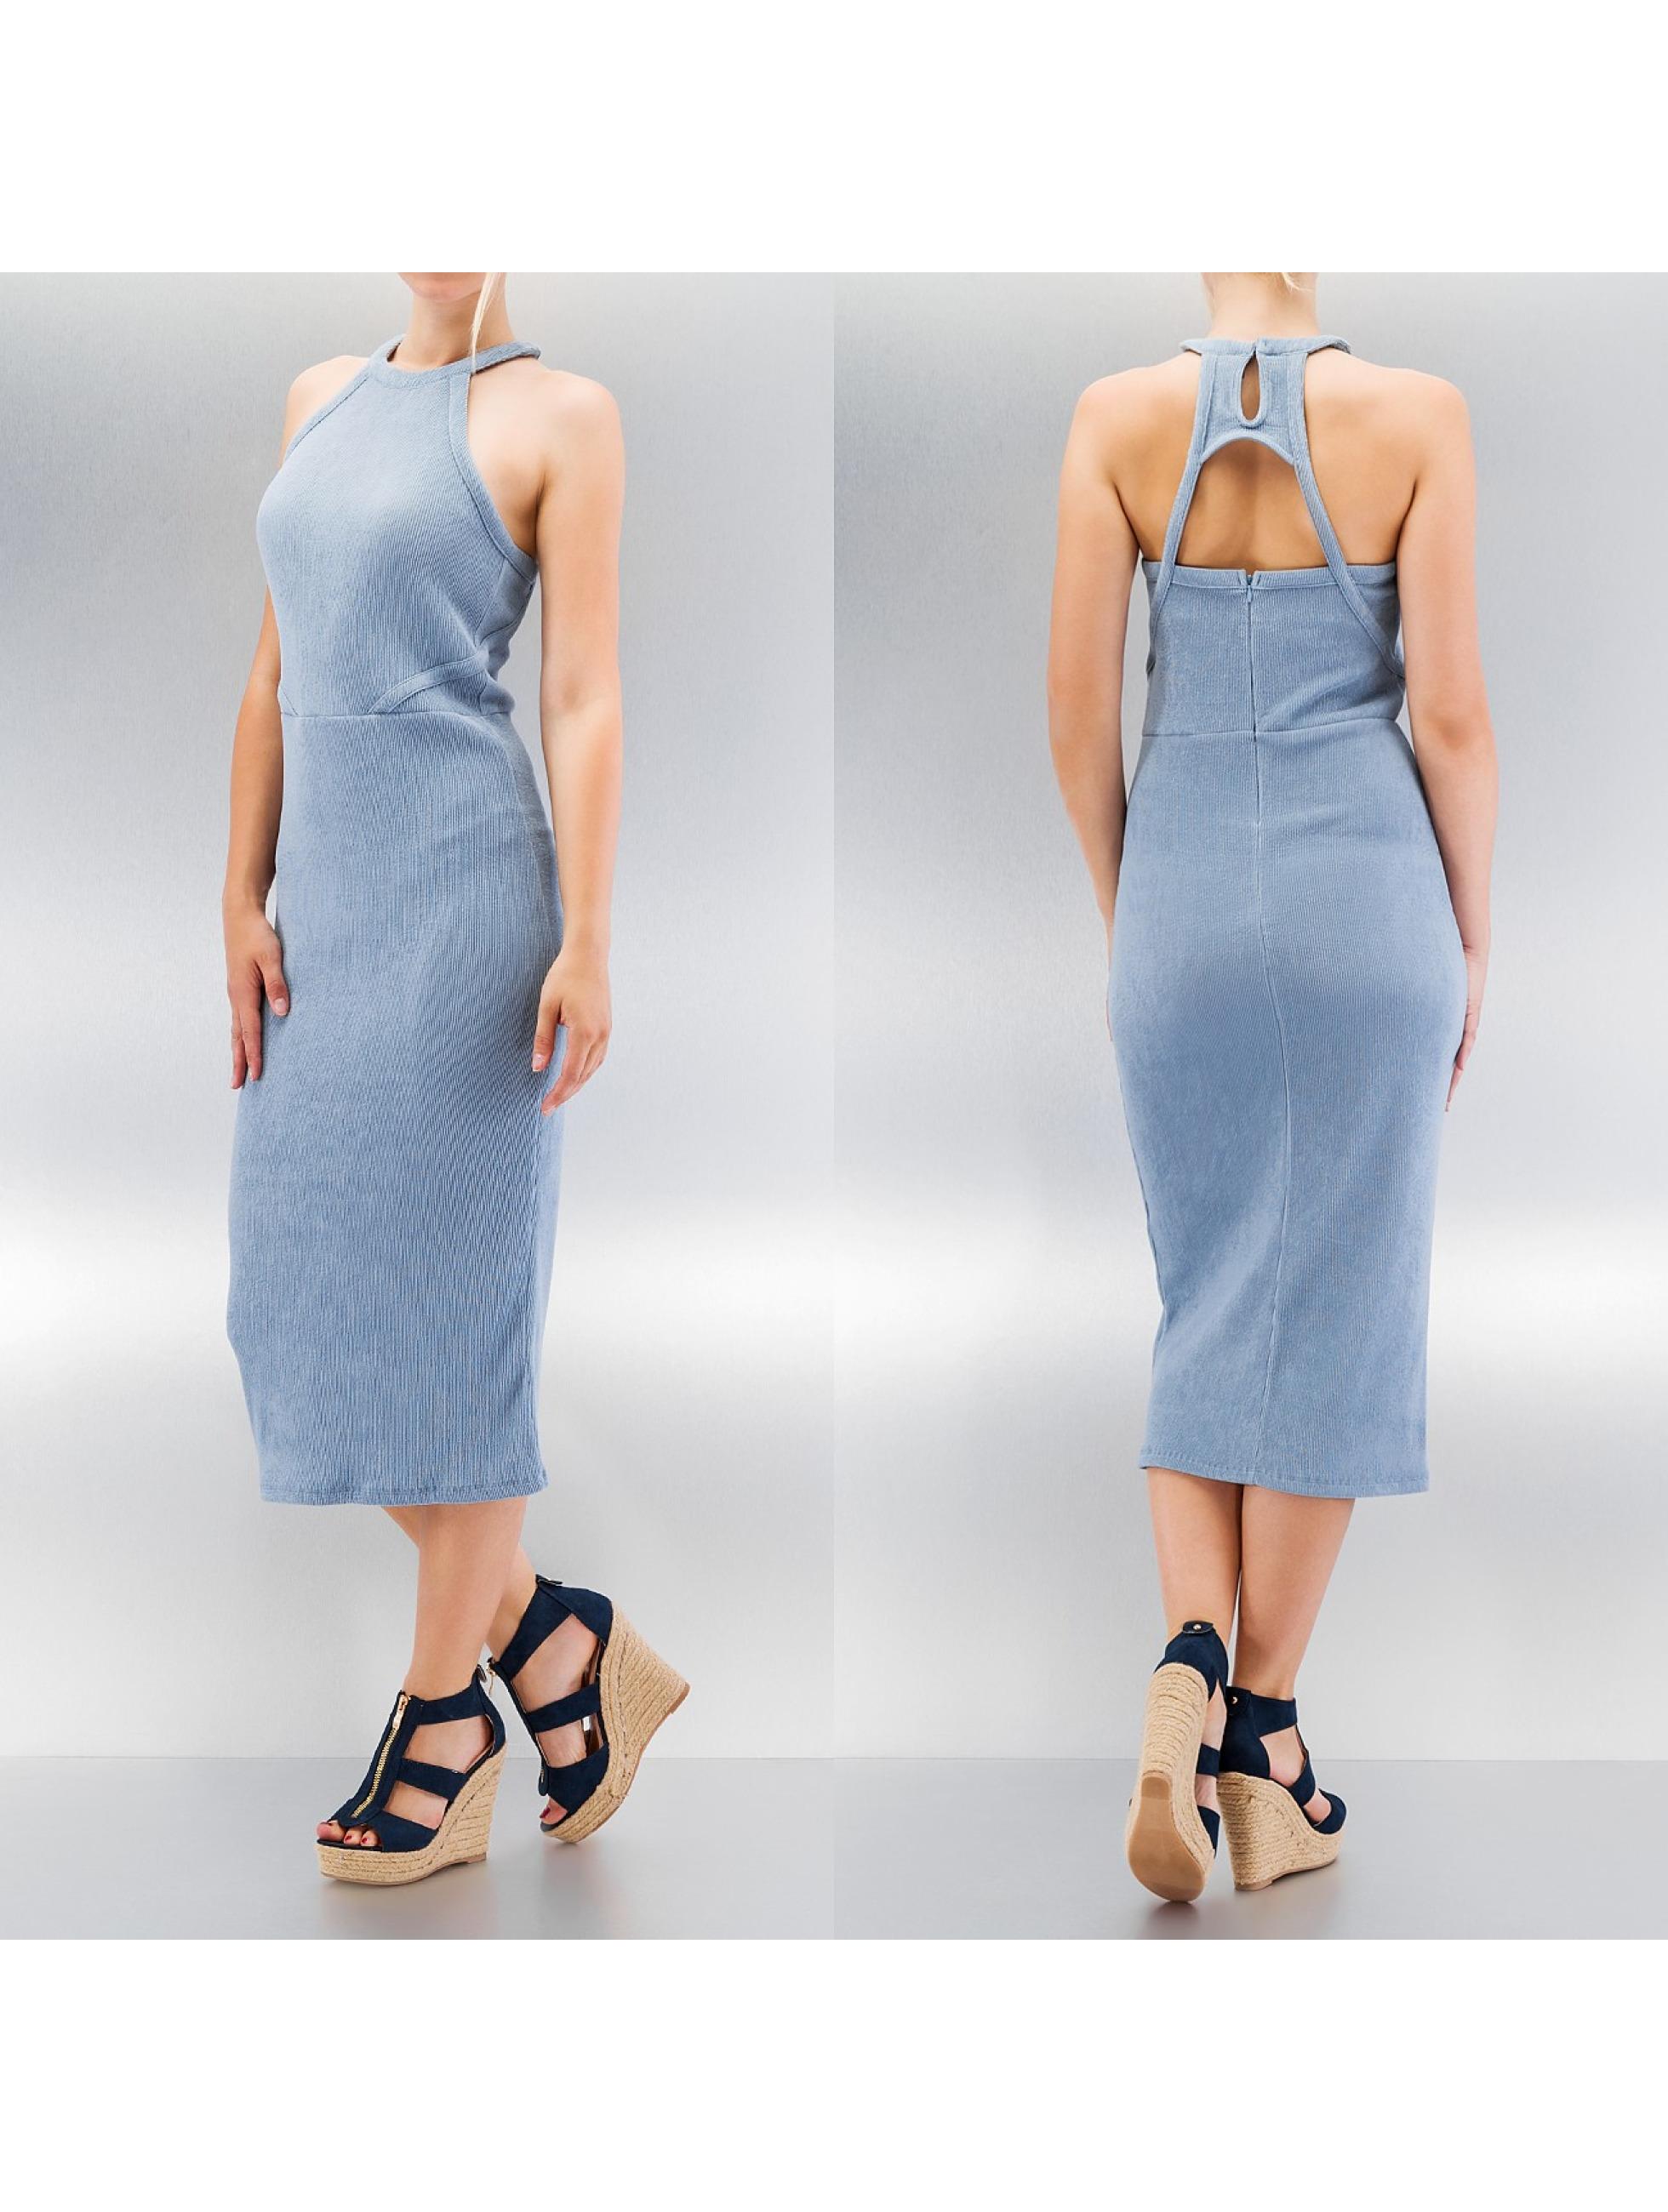 Vero Moda vmSayma Cut-Out Dress Dusty Blue Sale Angebote